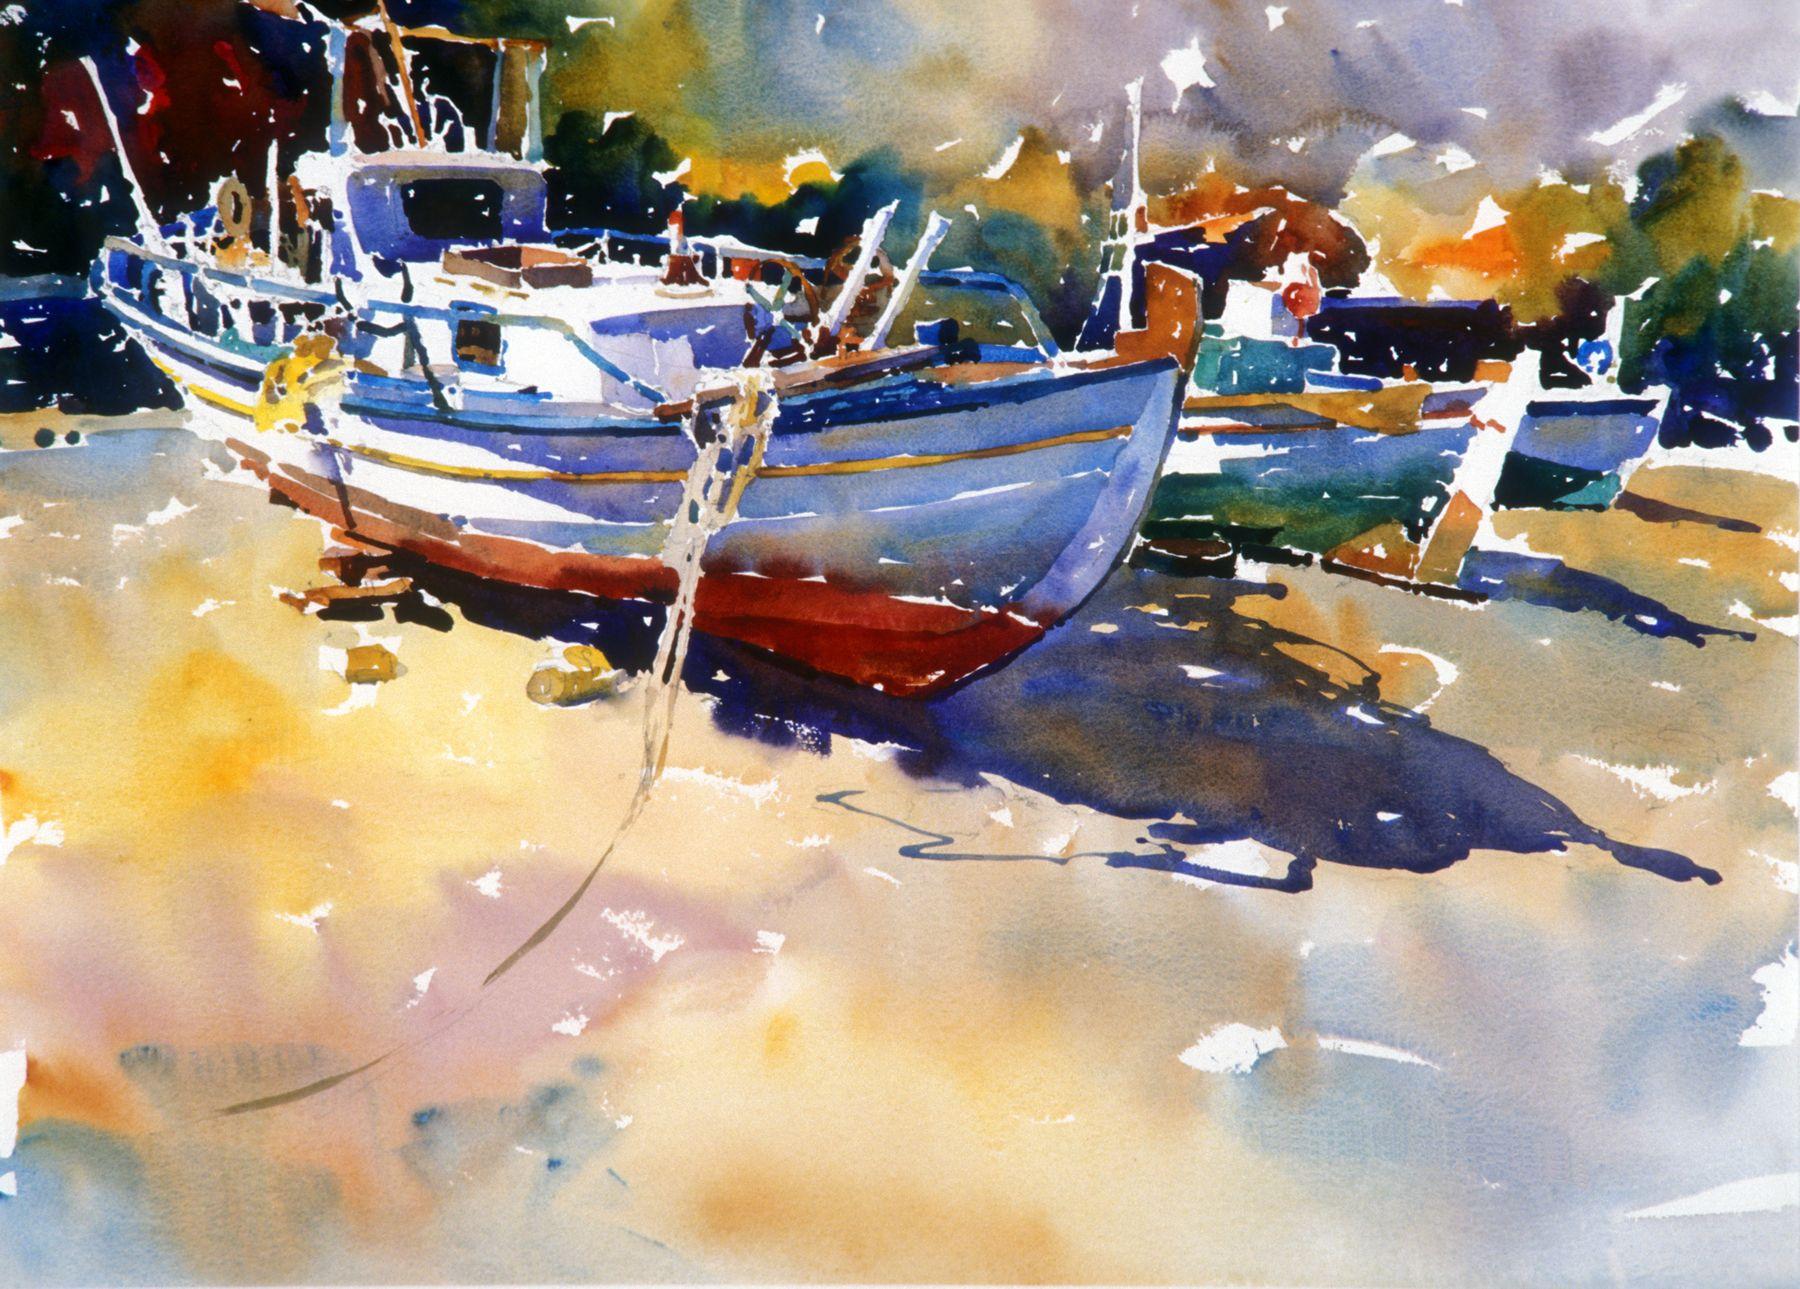 Watercolor artist magazine palm coast fl - Steve Rogers Watercolor Google Search